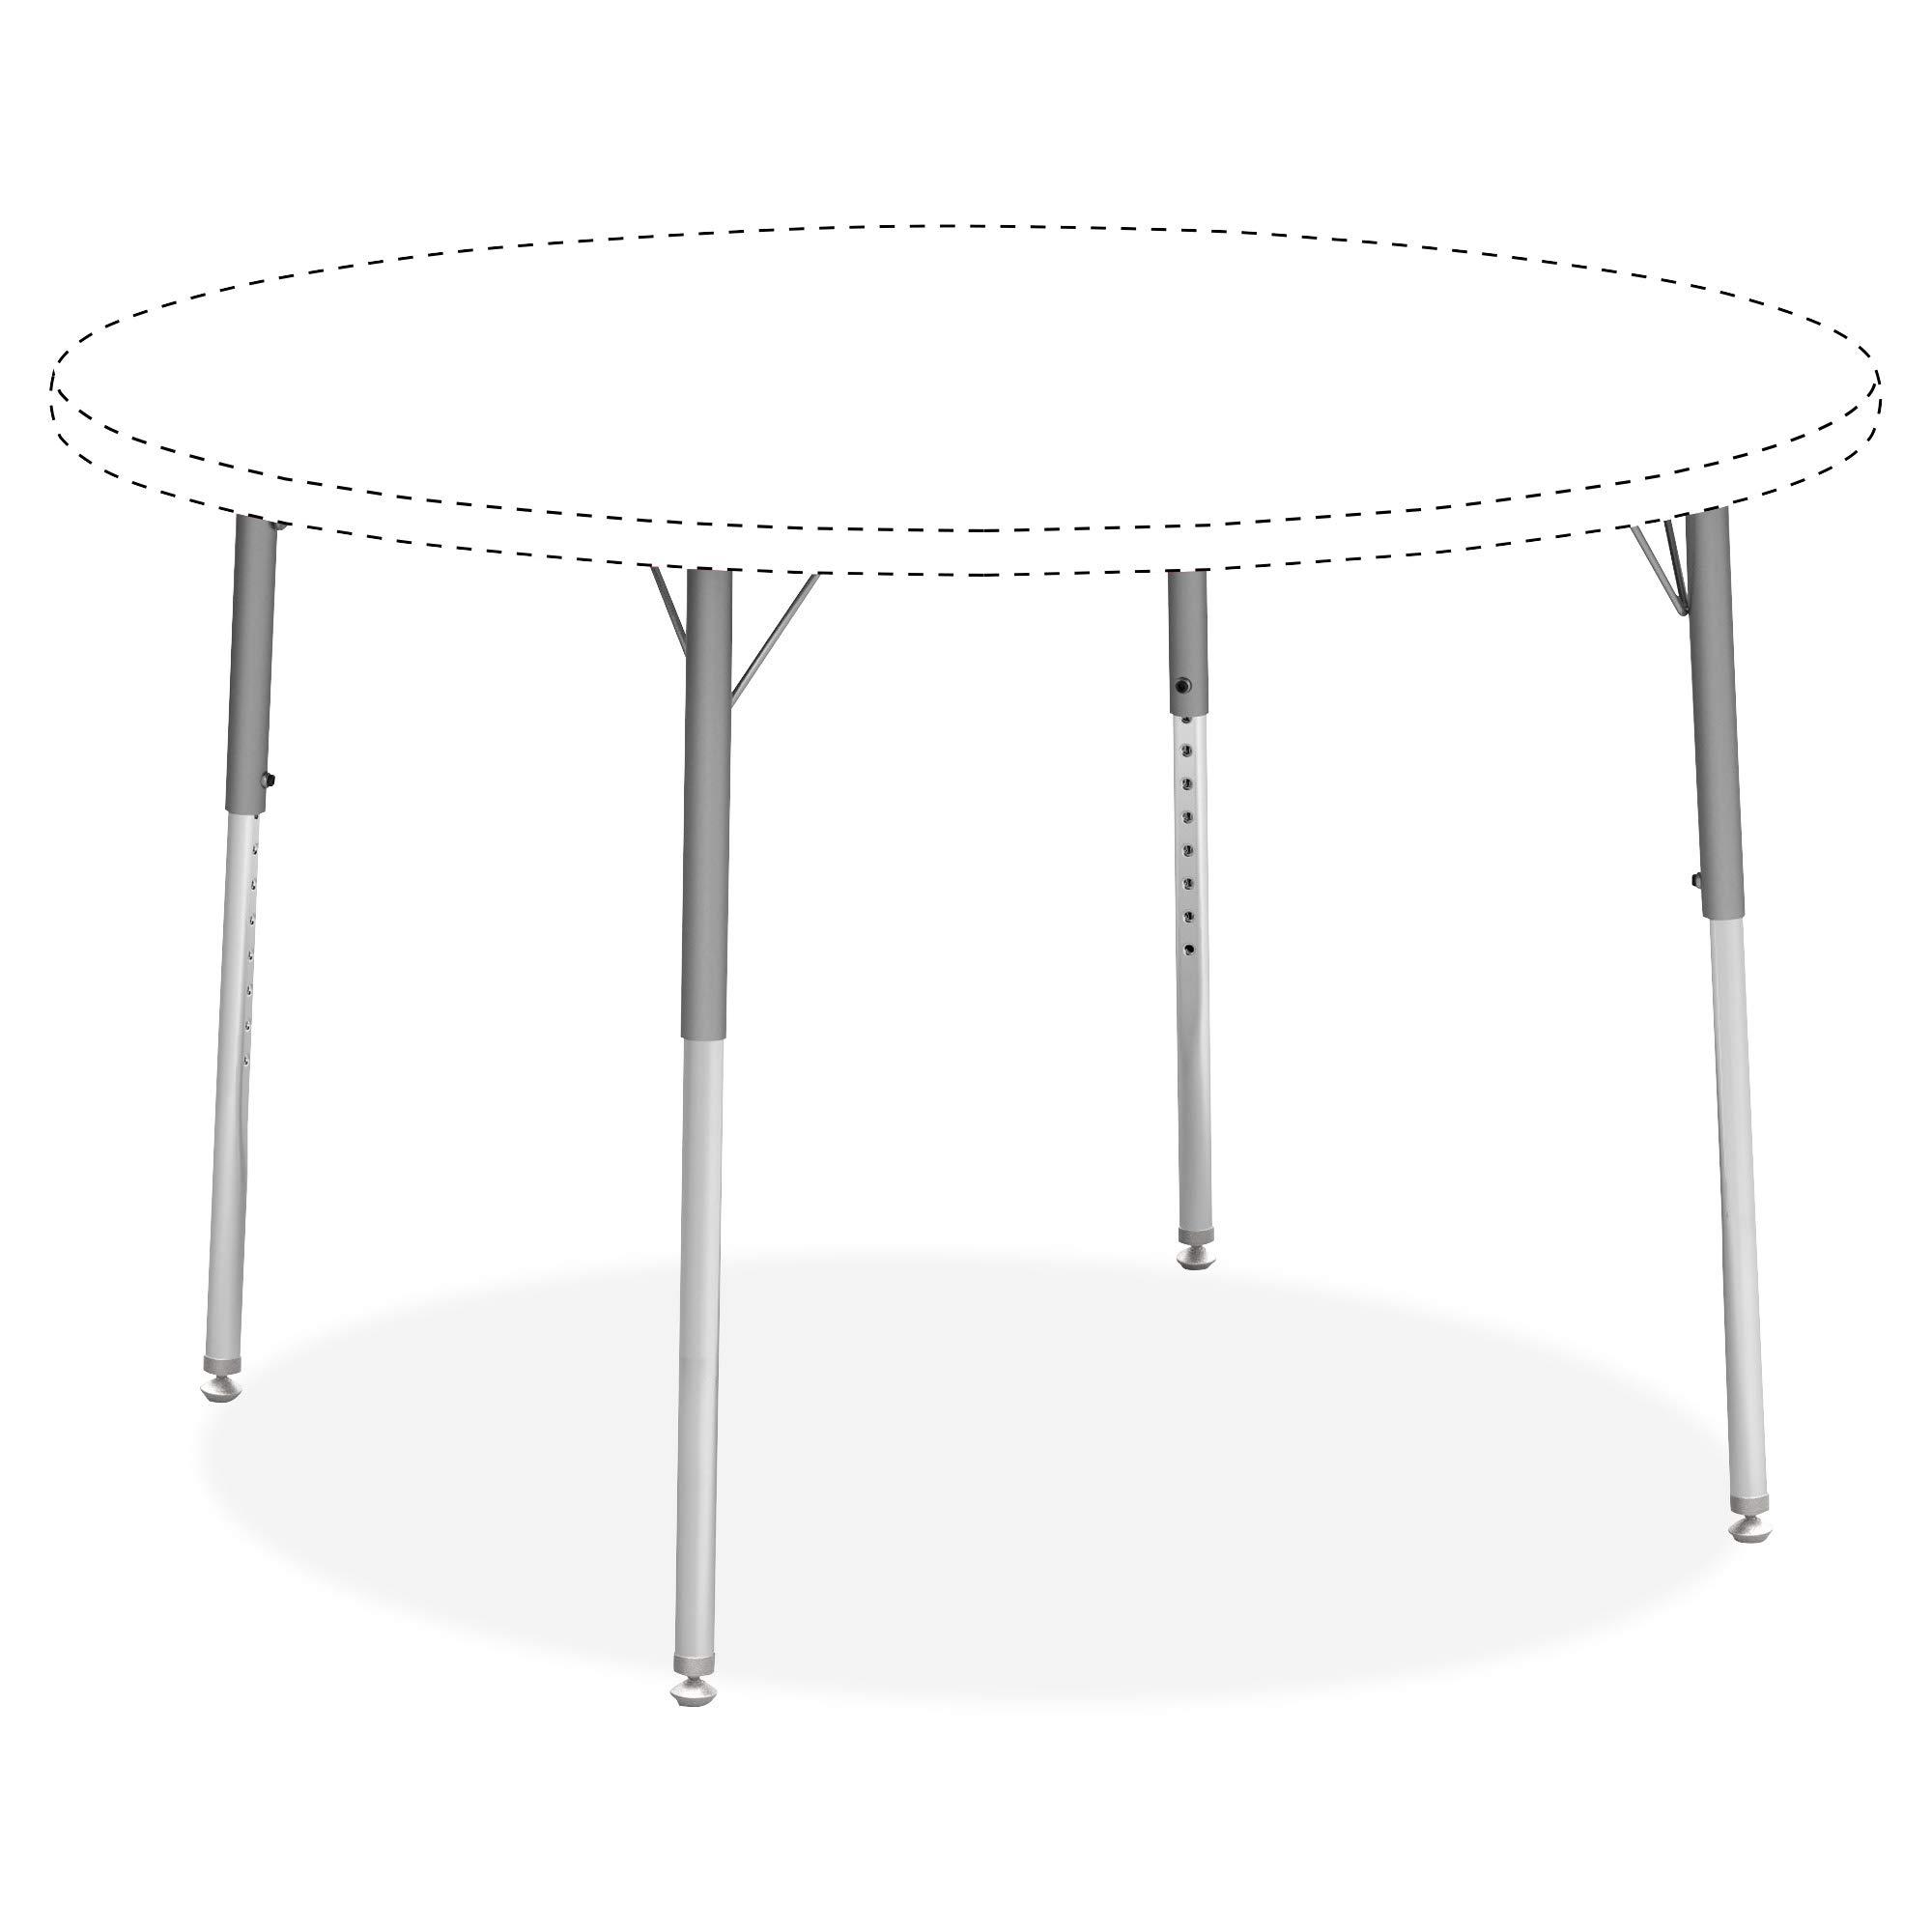 Lorell 99926 Classroom Activity Table Standard Height Adjustable Kit Leg, Chrome, Silver Mist by Lorell